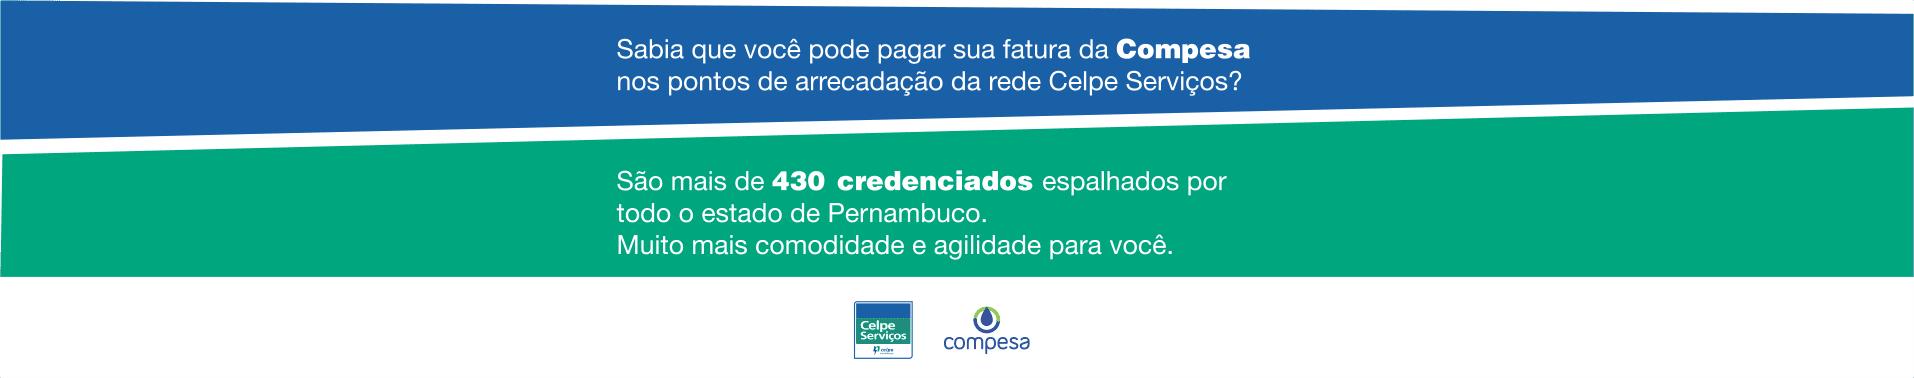 celpe_compesa